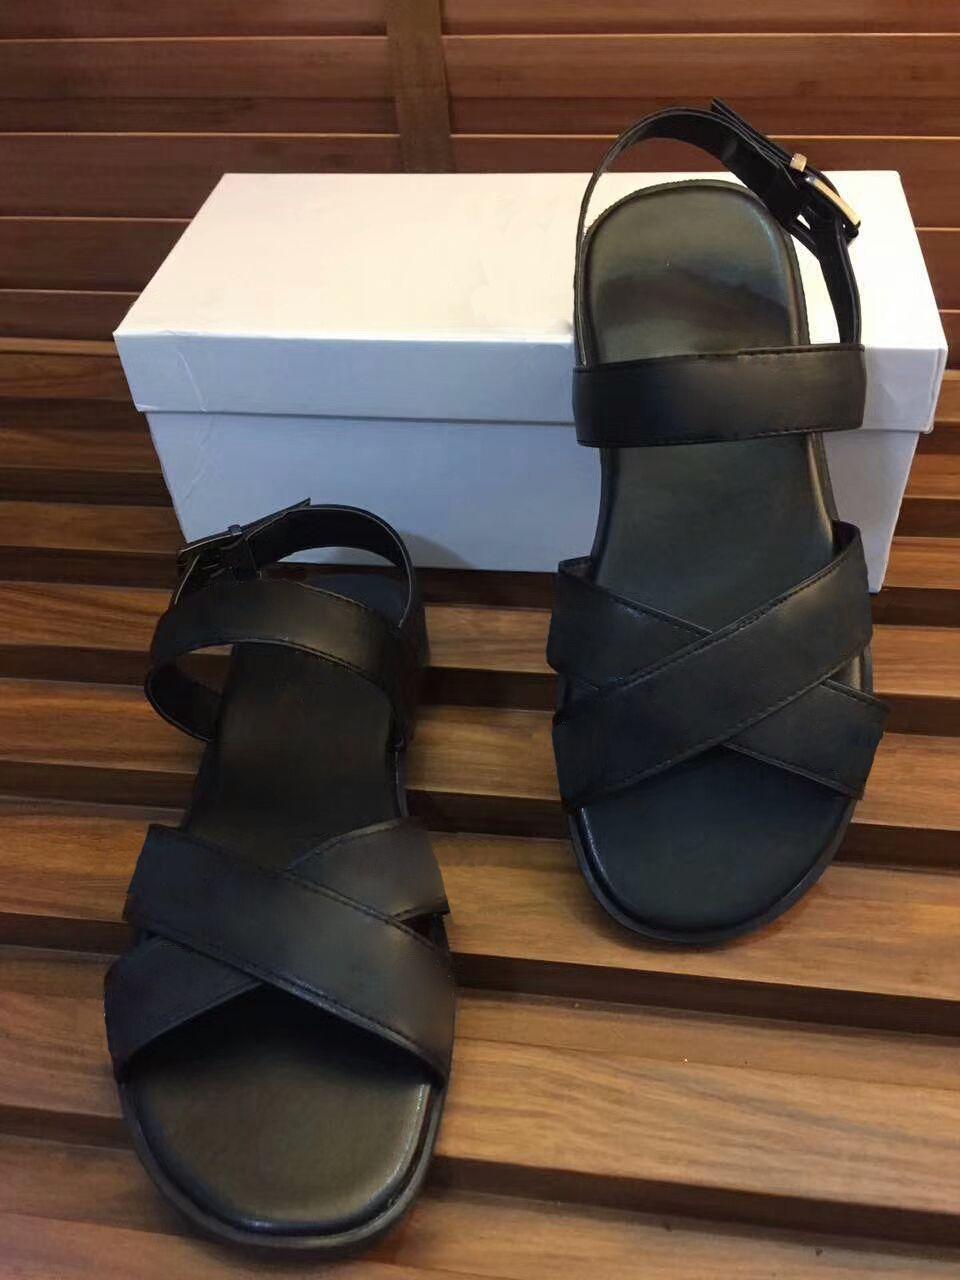 2430bcb5a0cc70 Dust Bags+ Box Sandals Medusa Scuffs Men Summer Huaraches Flip Flops  Slippers Loafers Slides Designer Sandals Slipper Medusa Slippers Medusa  Online with ...